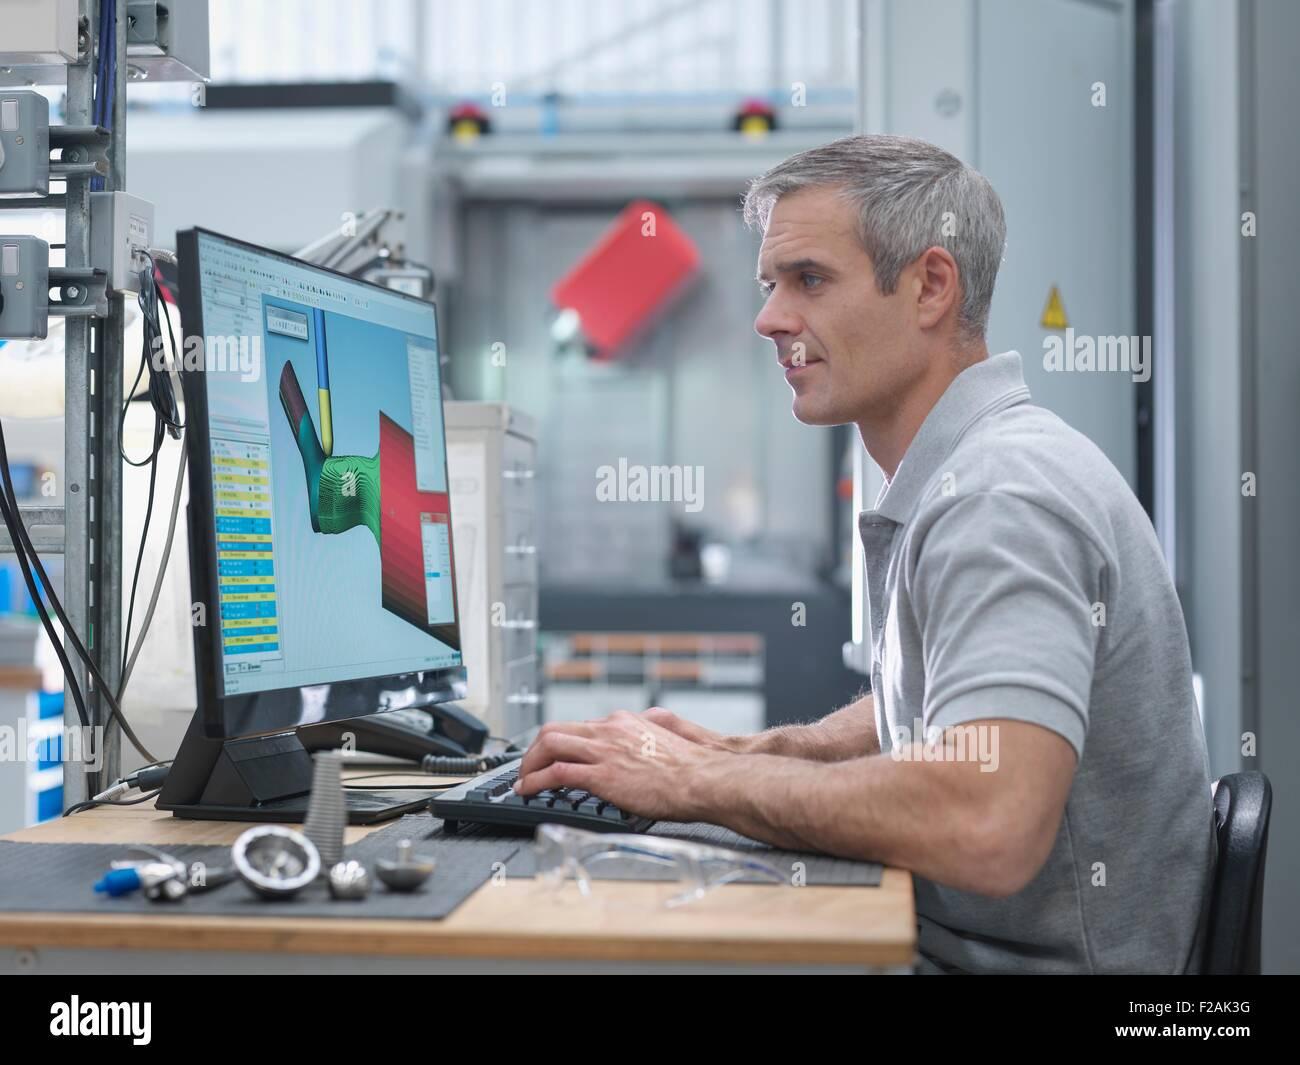 Engineer watching CNC lathe progress on screen in orthopaedic factory - Stock Image